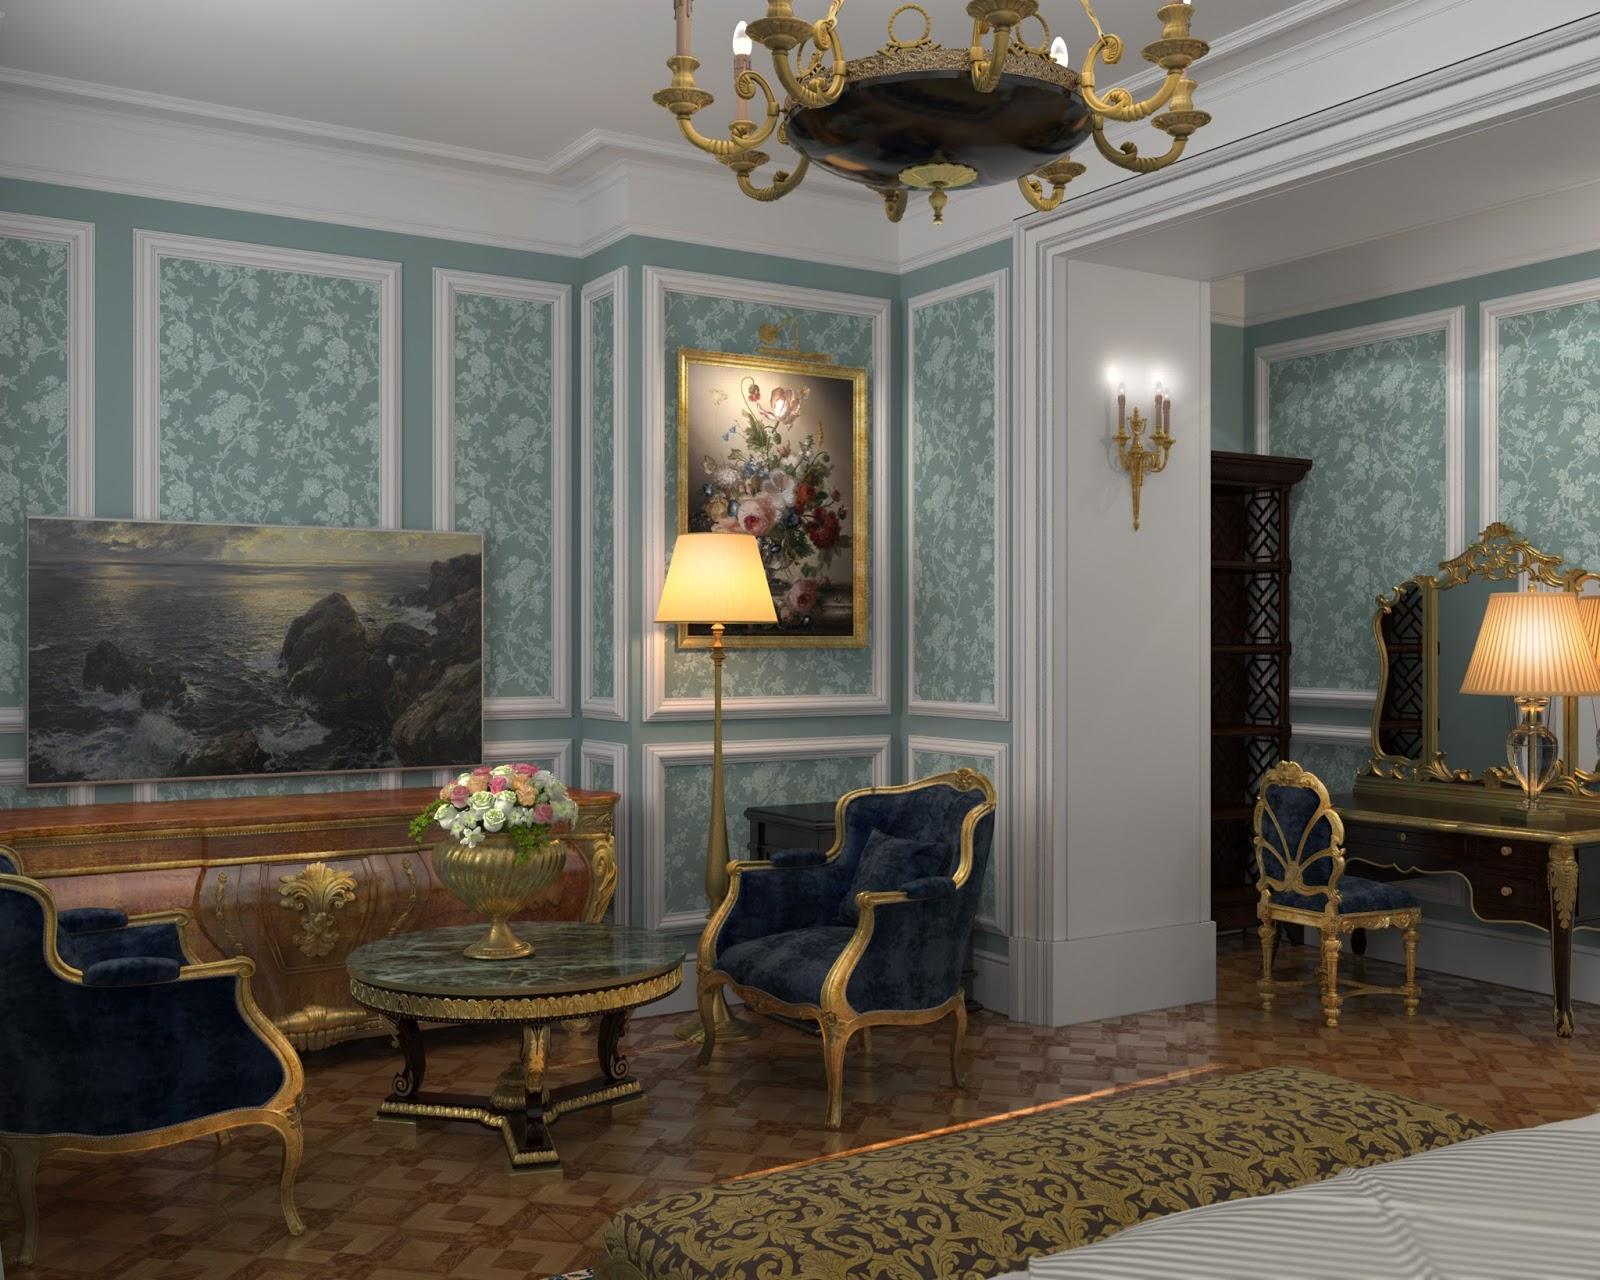 Darya girina interior design march 2015 - The Third Option For Bedroom